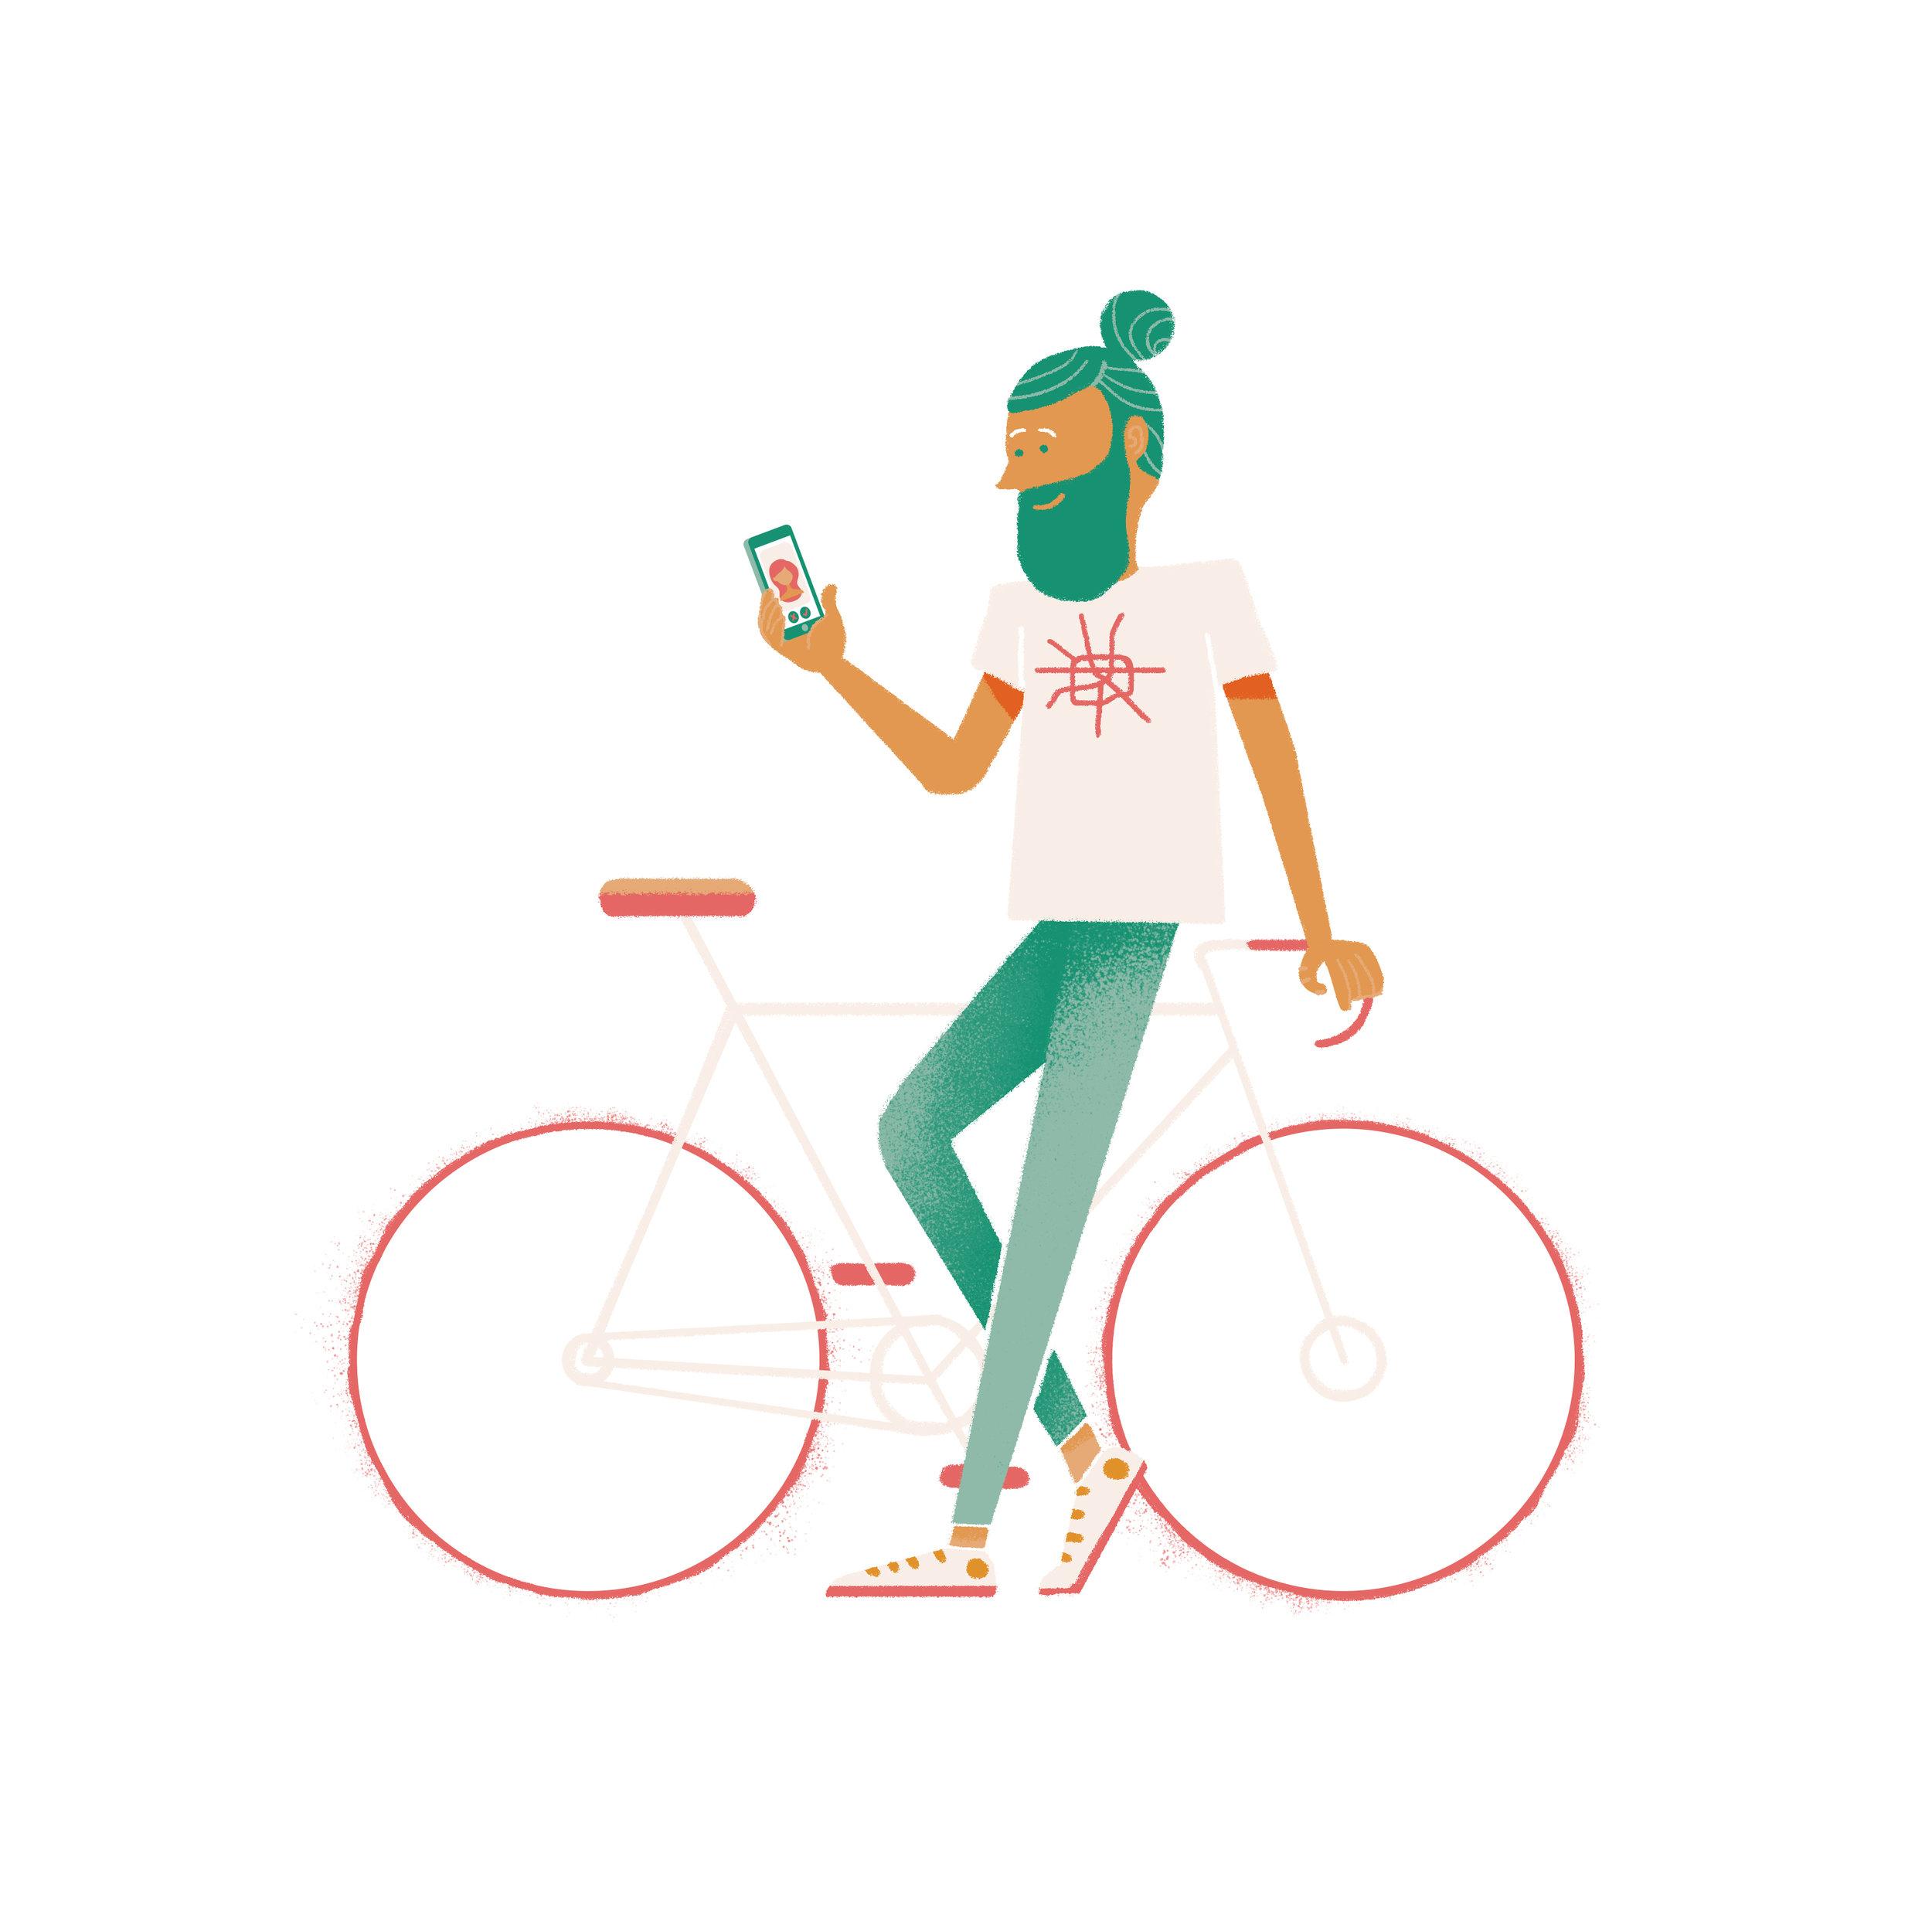 HOU-170821_LOVE_DATING_Man-On-Bike-01.jpg